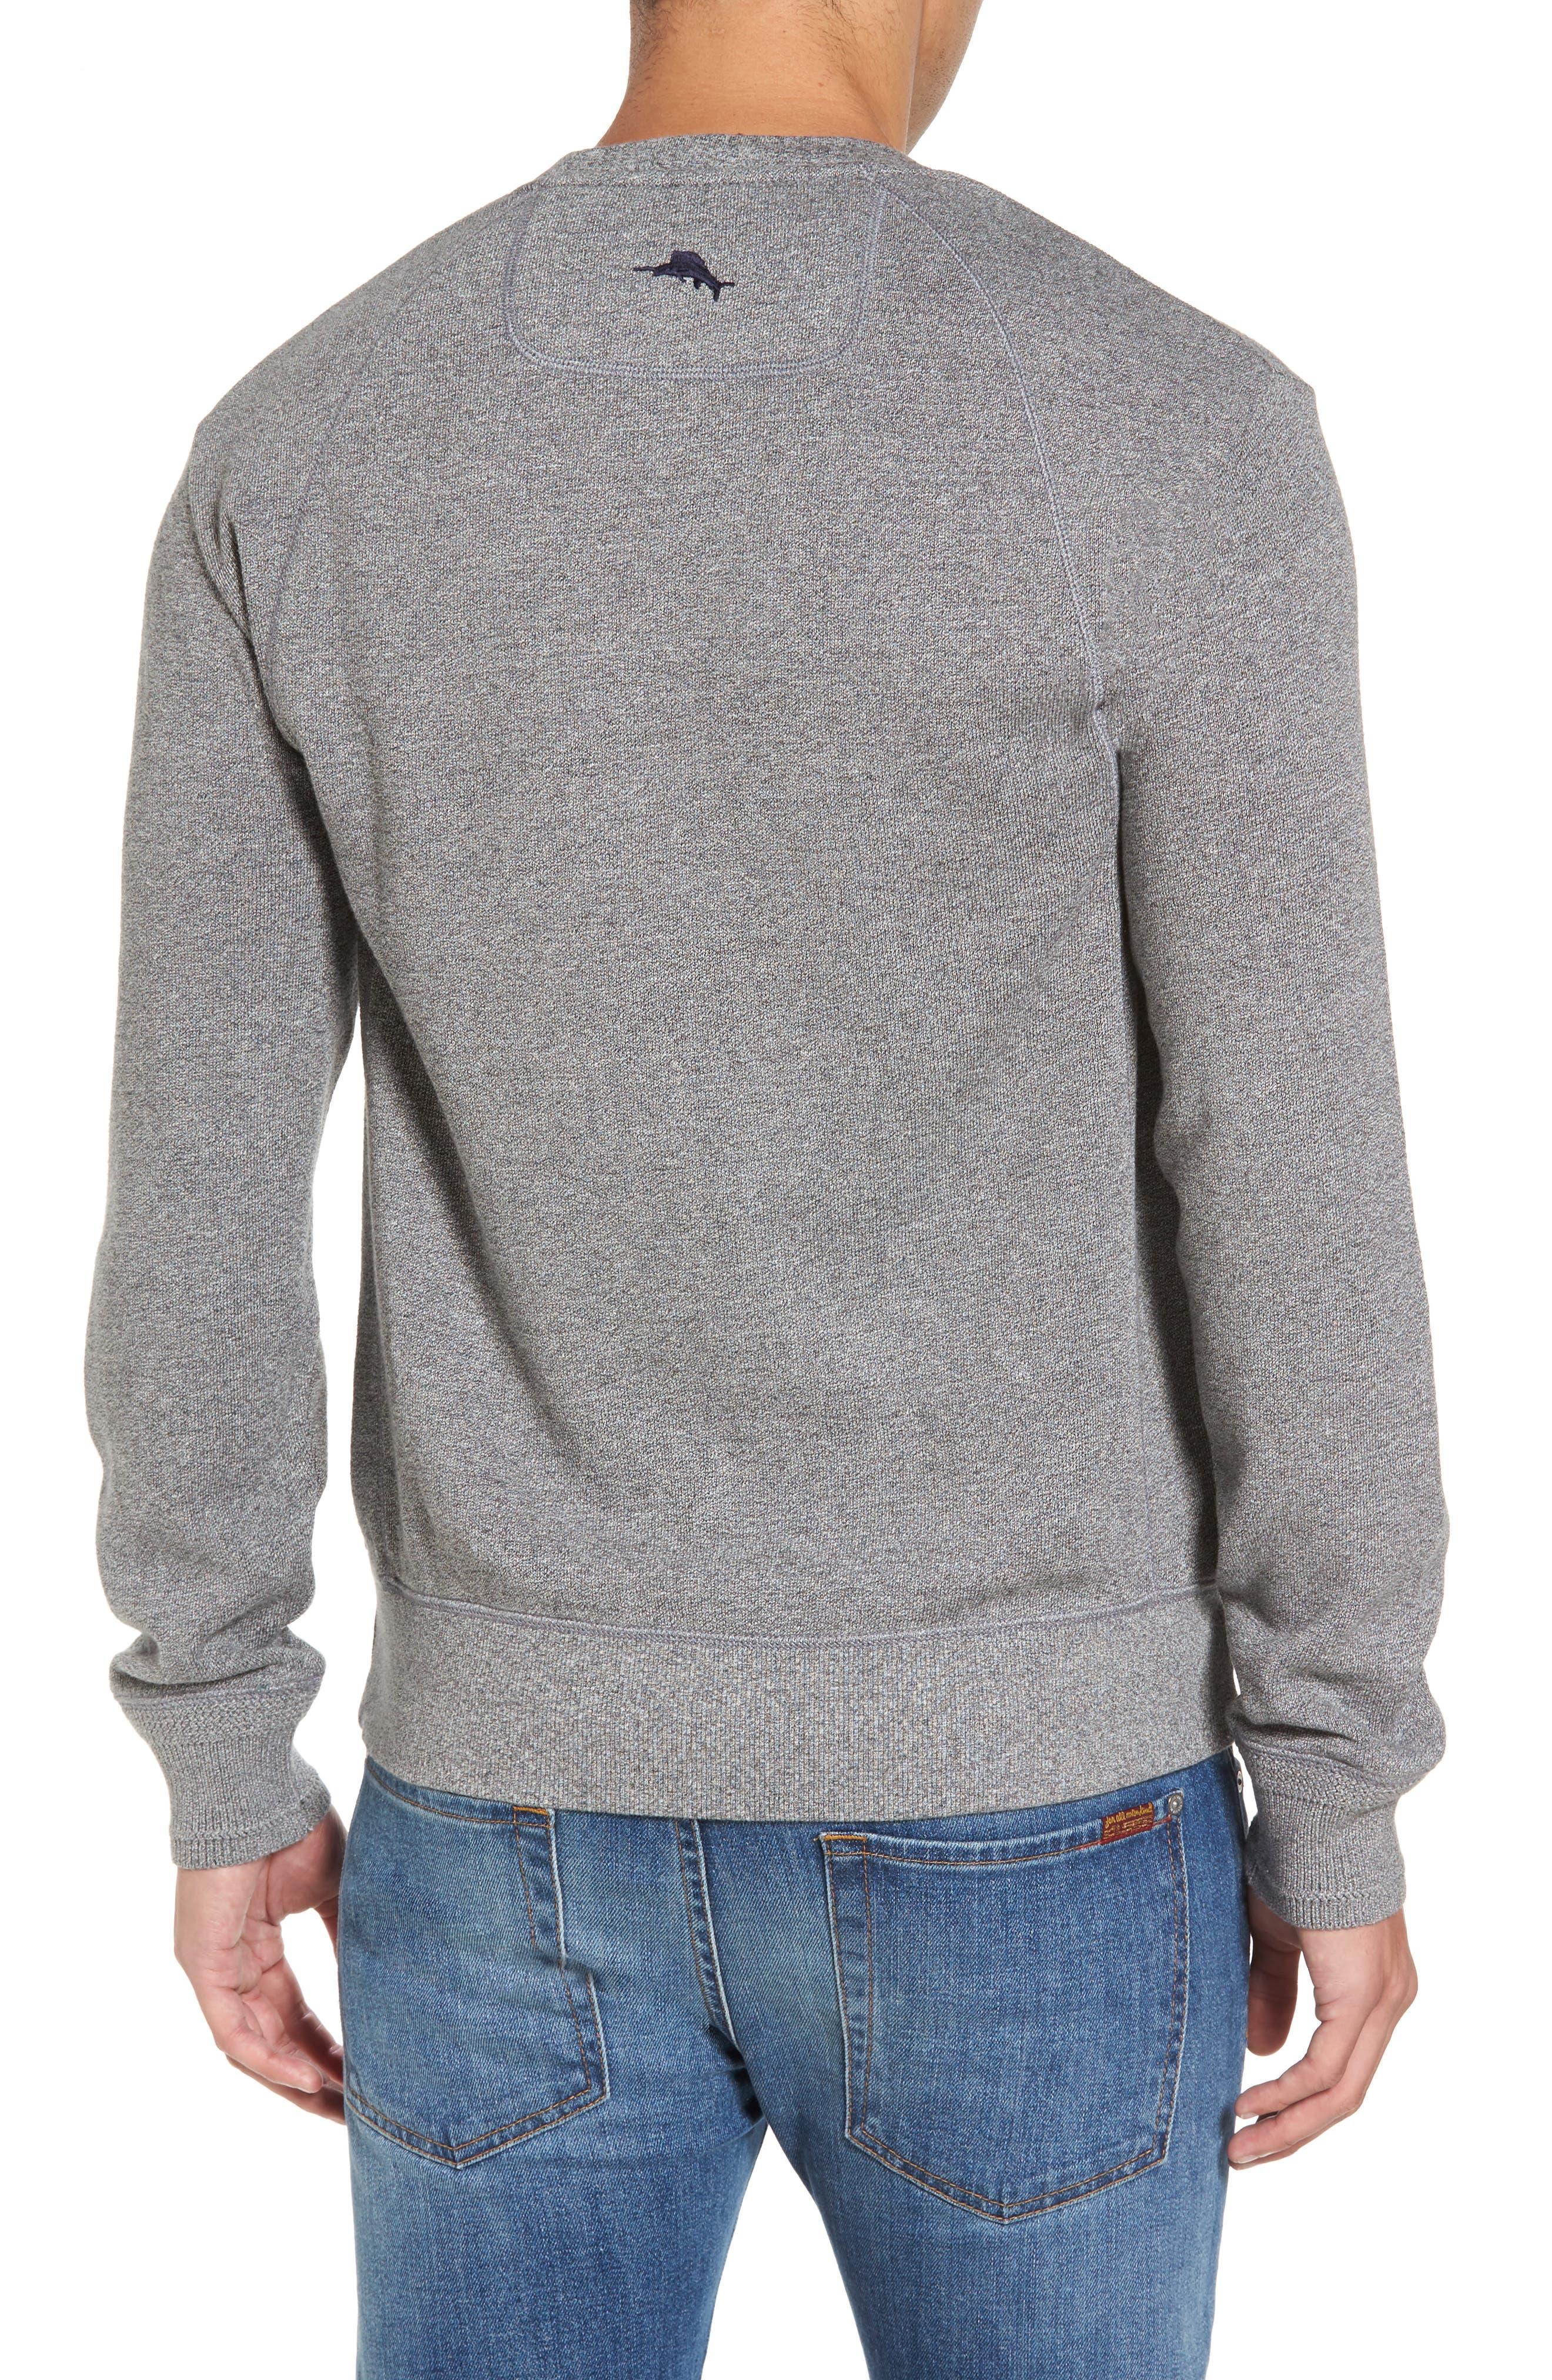 NFL Stitch of Liberty Embroidered Crewneck Sweatshirt,                             Alternate thumbnail 60, color,